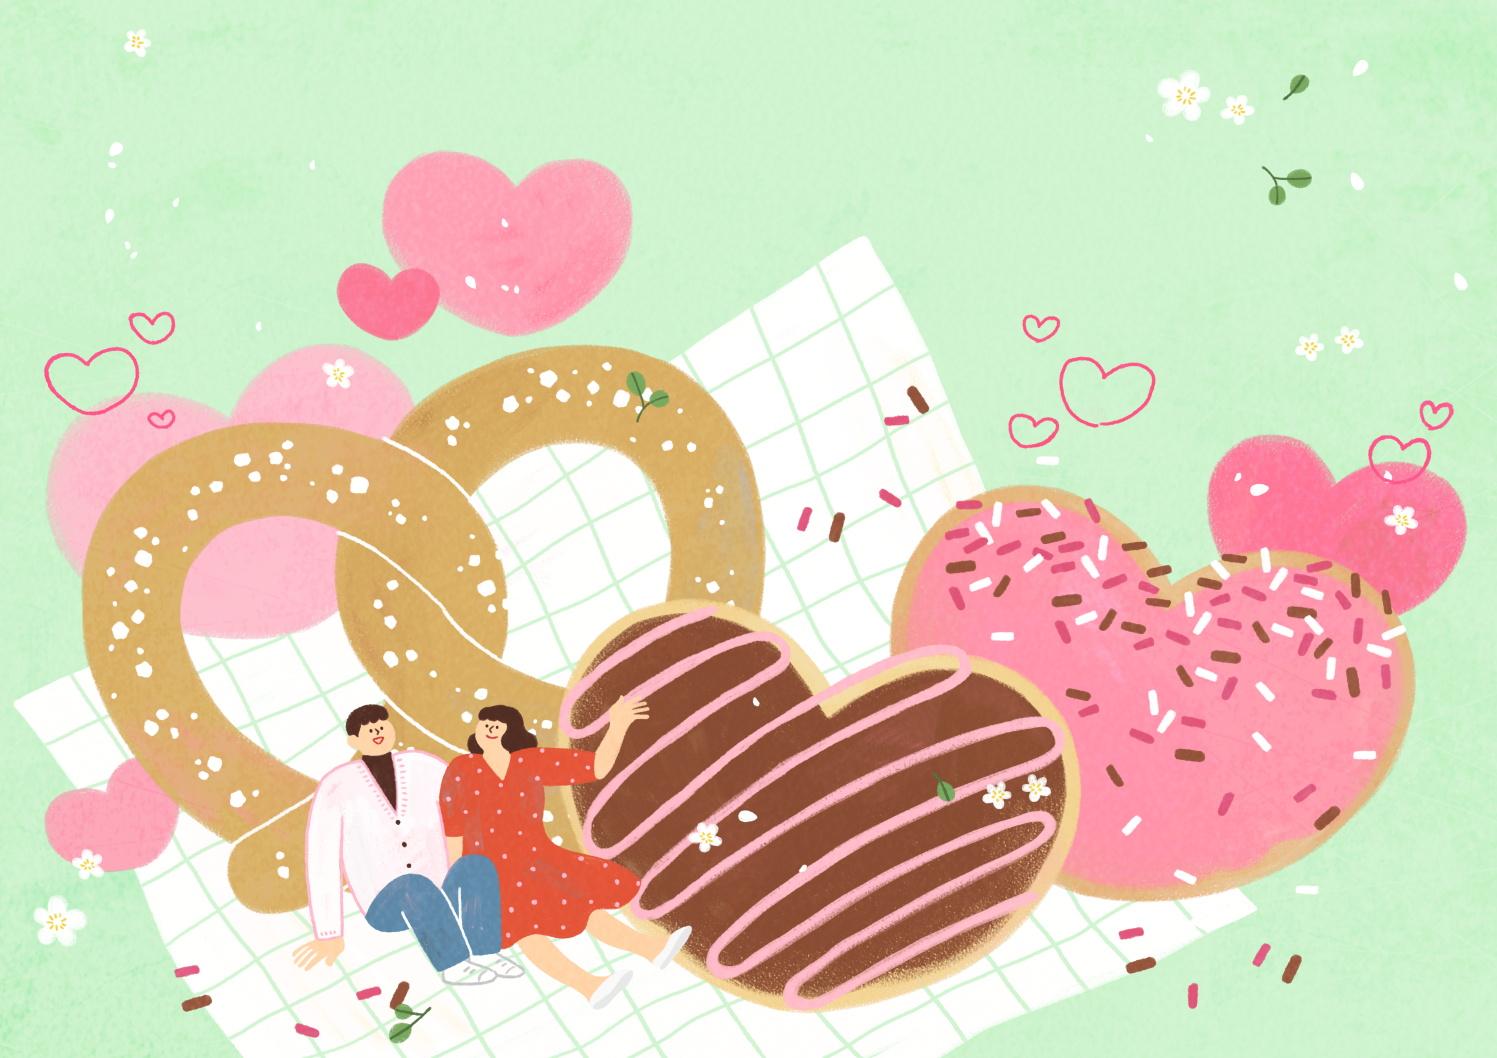 12款情人节七夕情侣手绘插画海报传单设计PSD素材 Valentines Day Couple Hand Drawn Illustration插图6